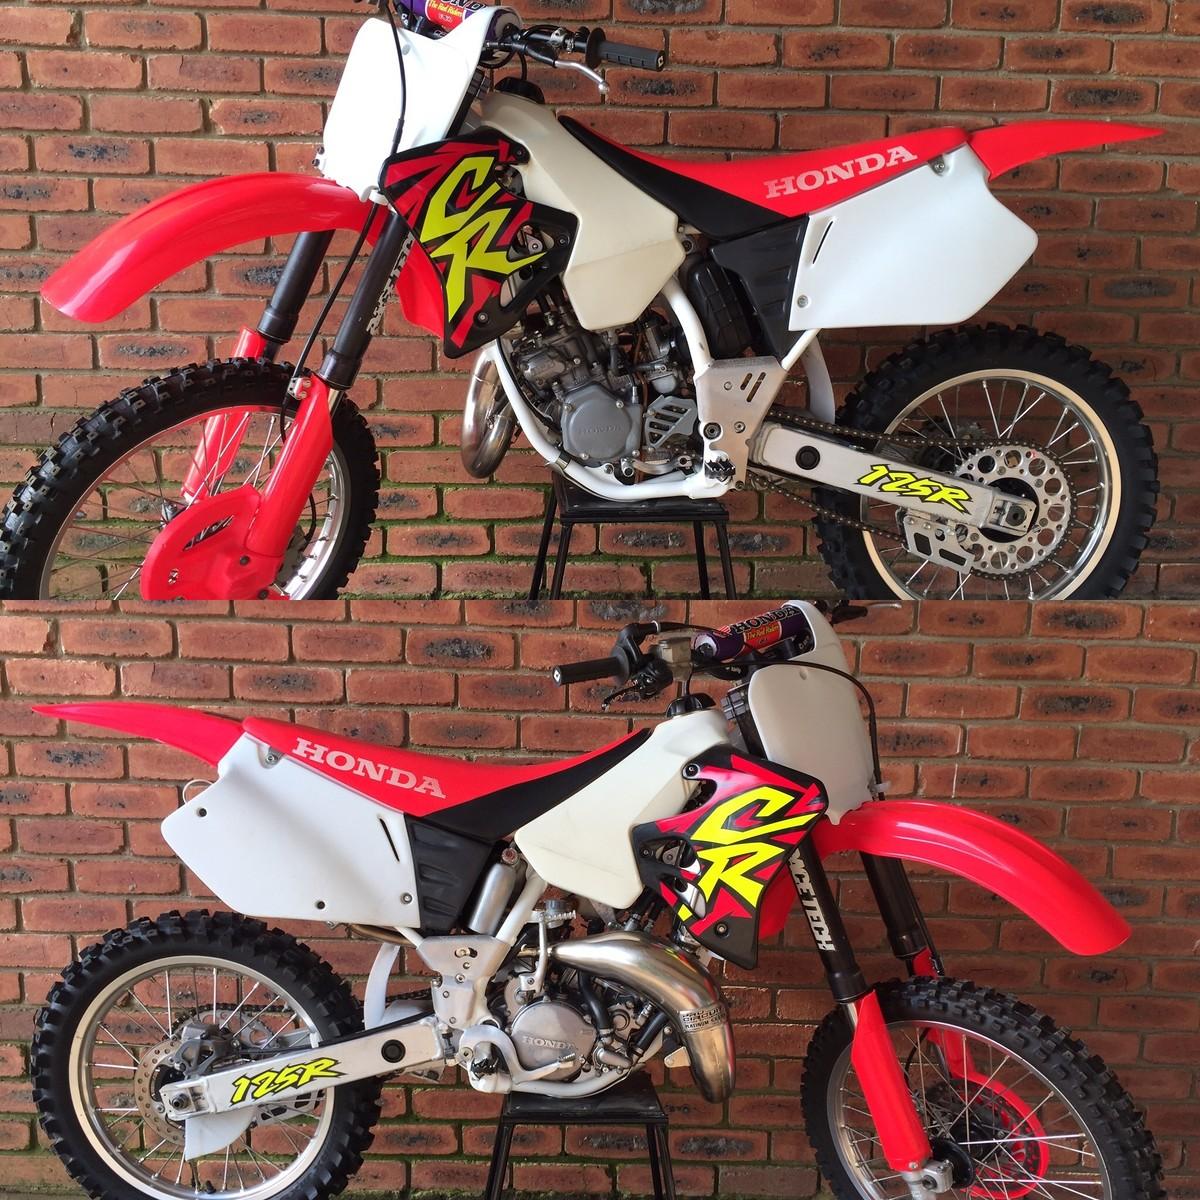 Fxr For Sale >> 1996 Honda CR125 , - Old School Moto - Motocross Forums / Message Boards - Vital MX